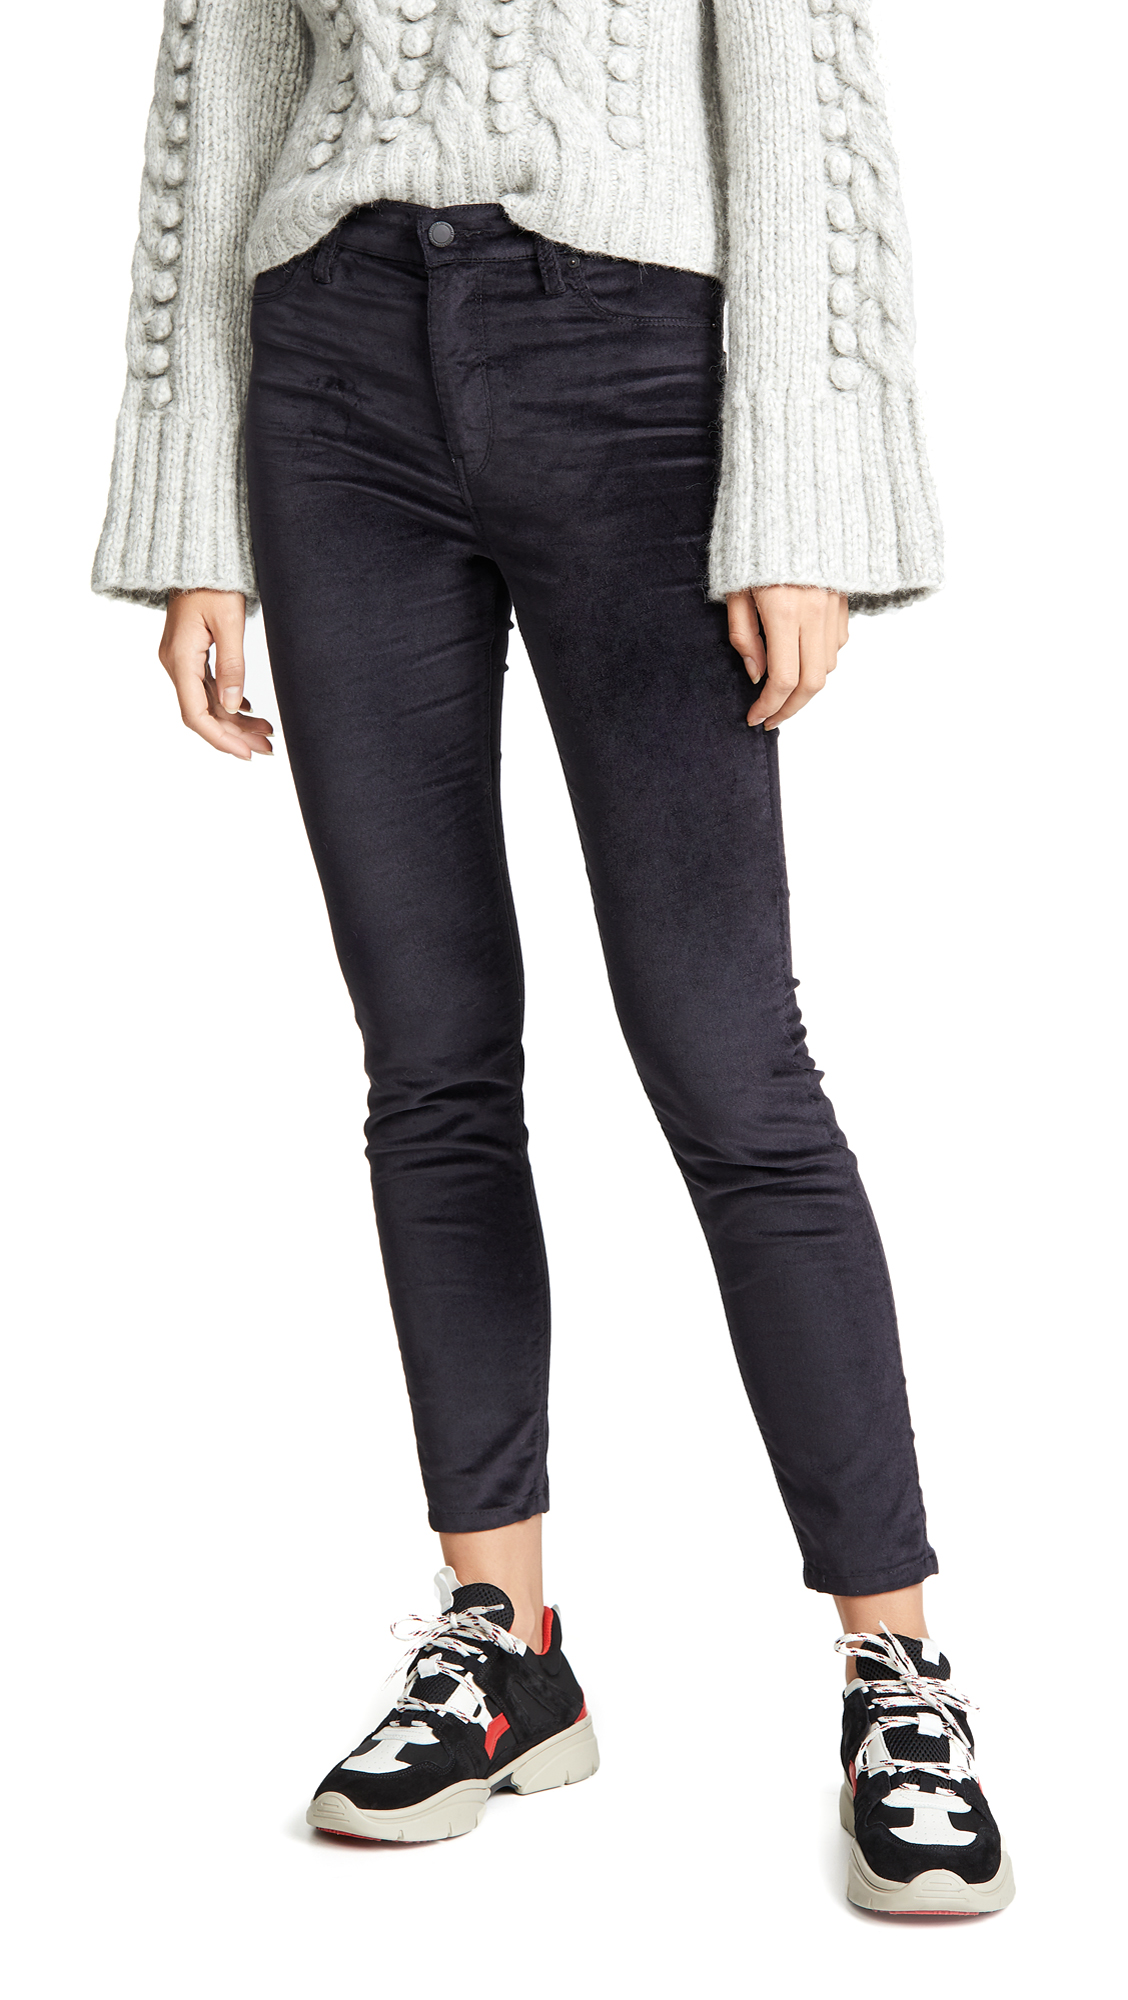 Hudson Barbara High Waist Skinny Jeans In Granite